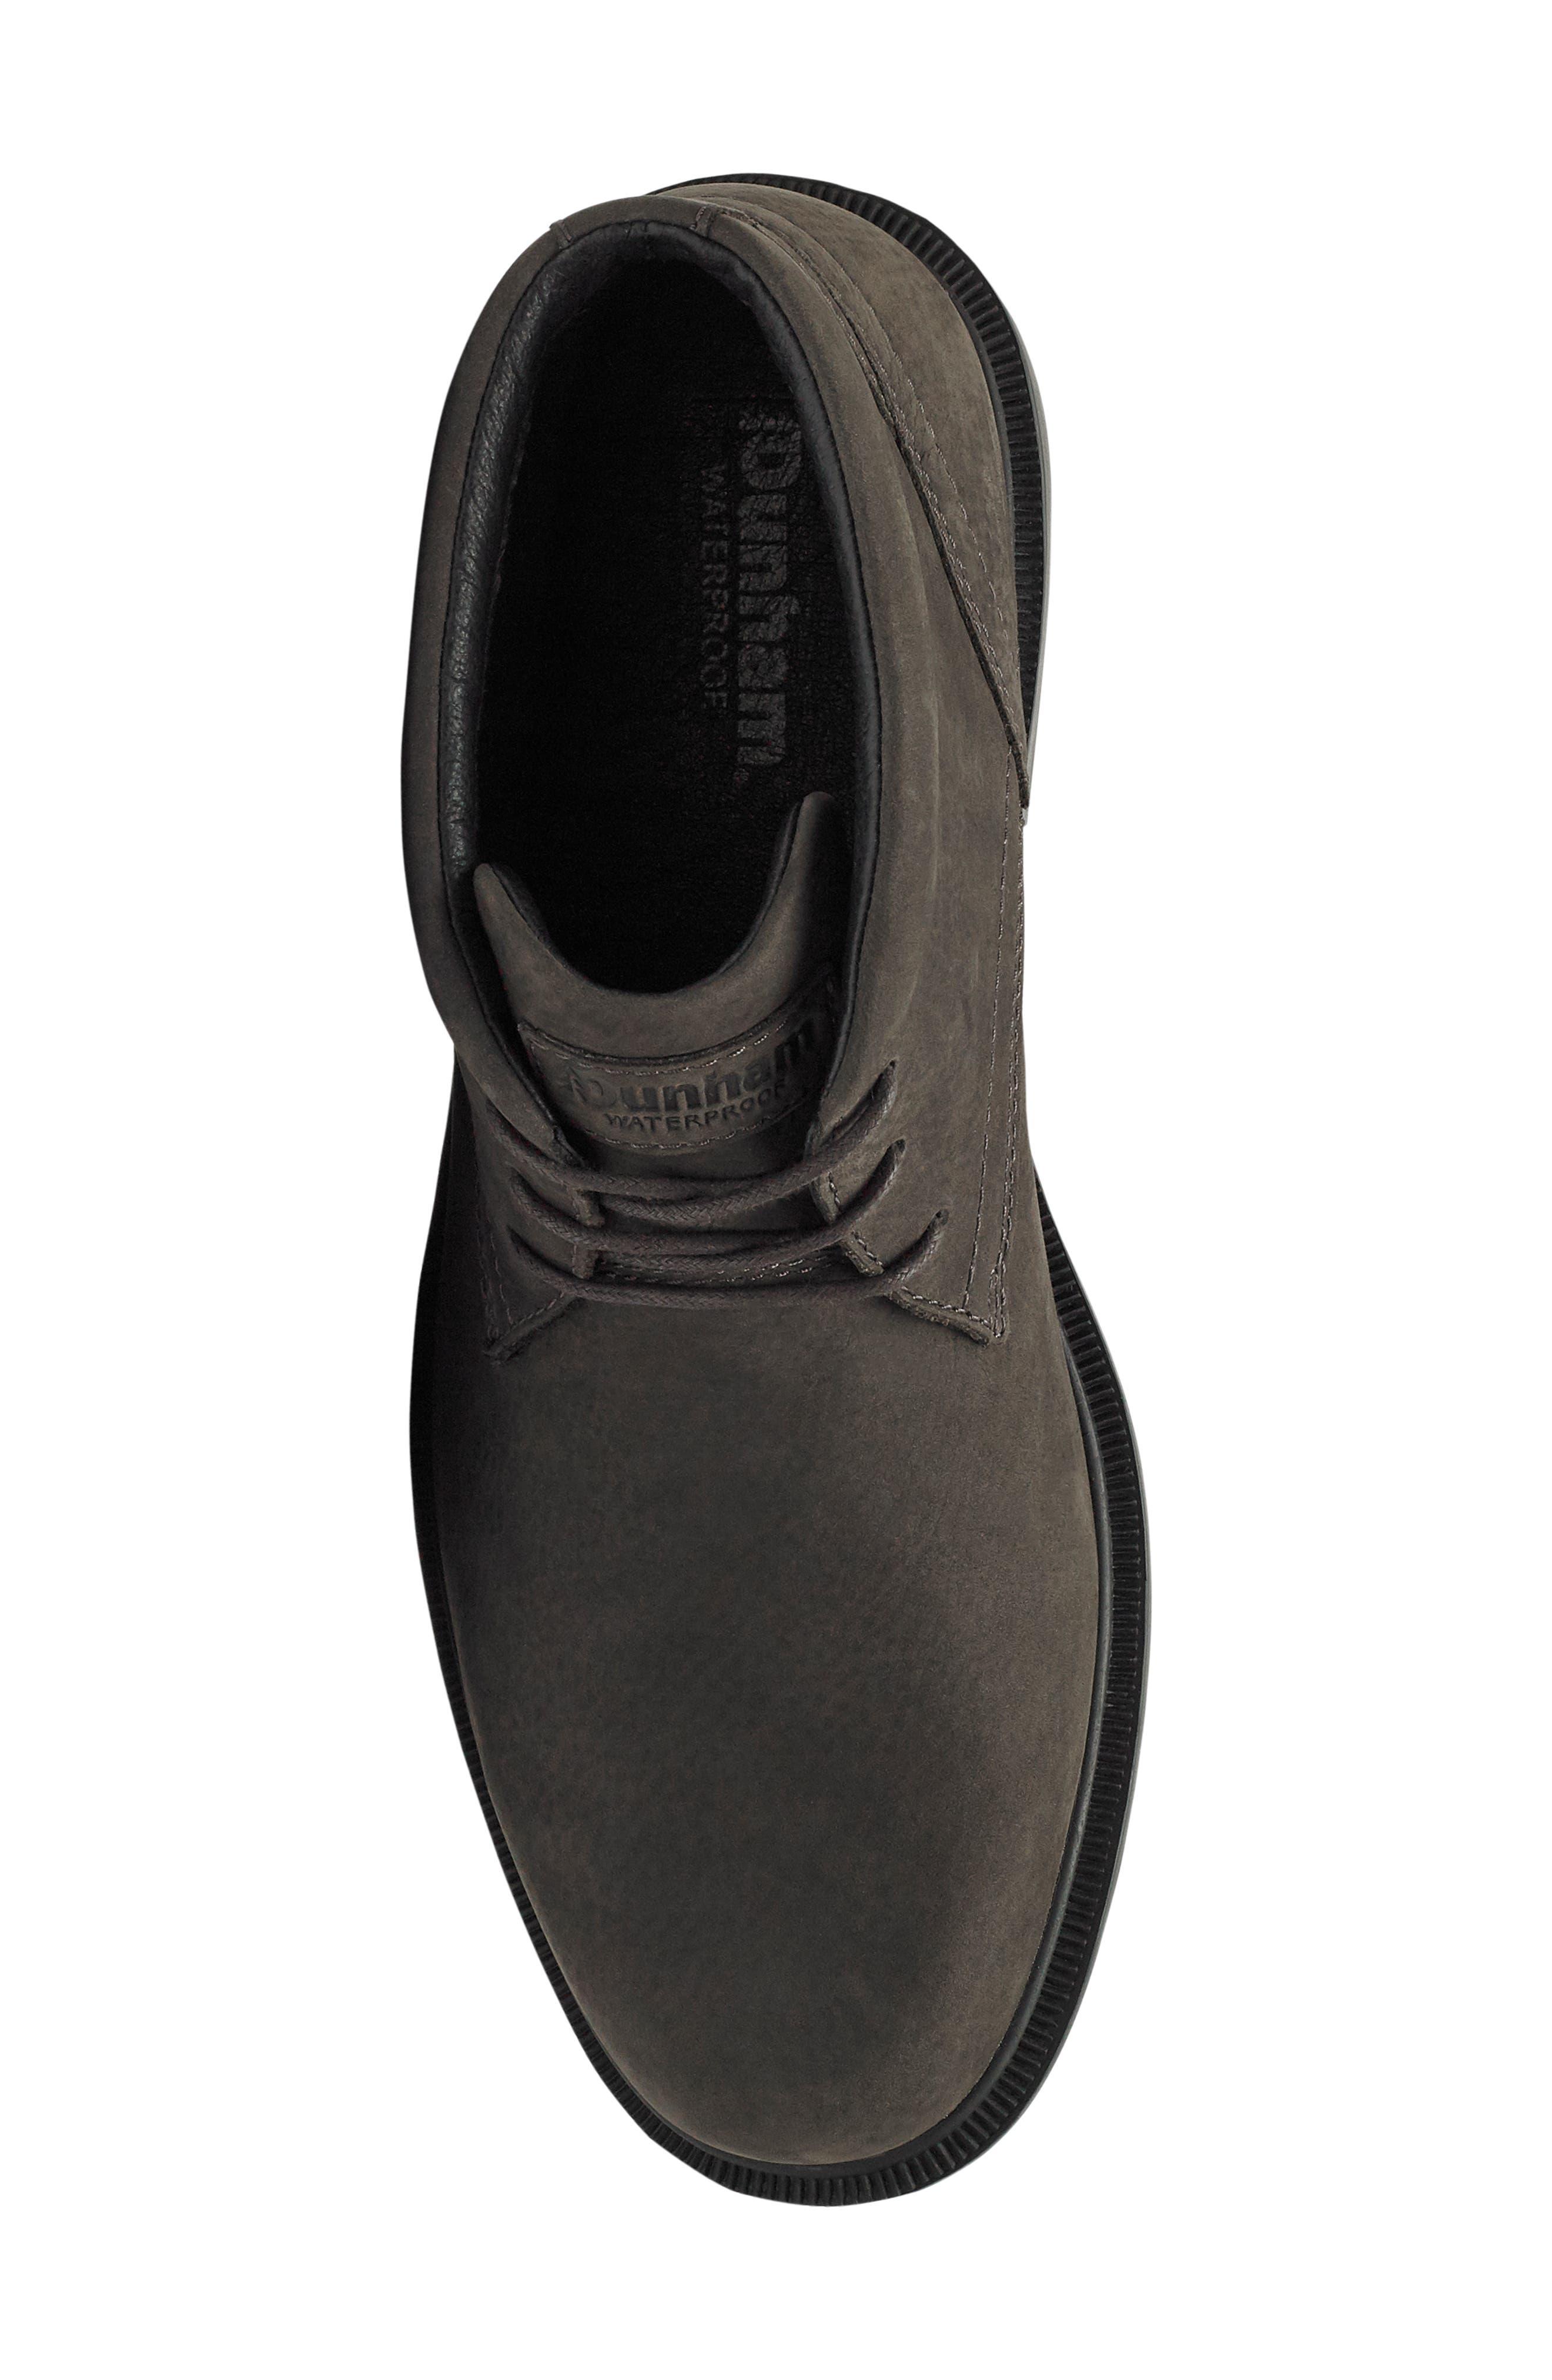 DUNHAM, Jericho Waterproof Chukka Boot, Alternate thumbnail 5, color, 020